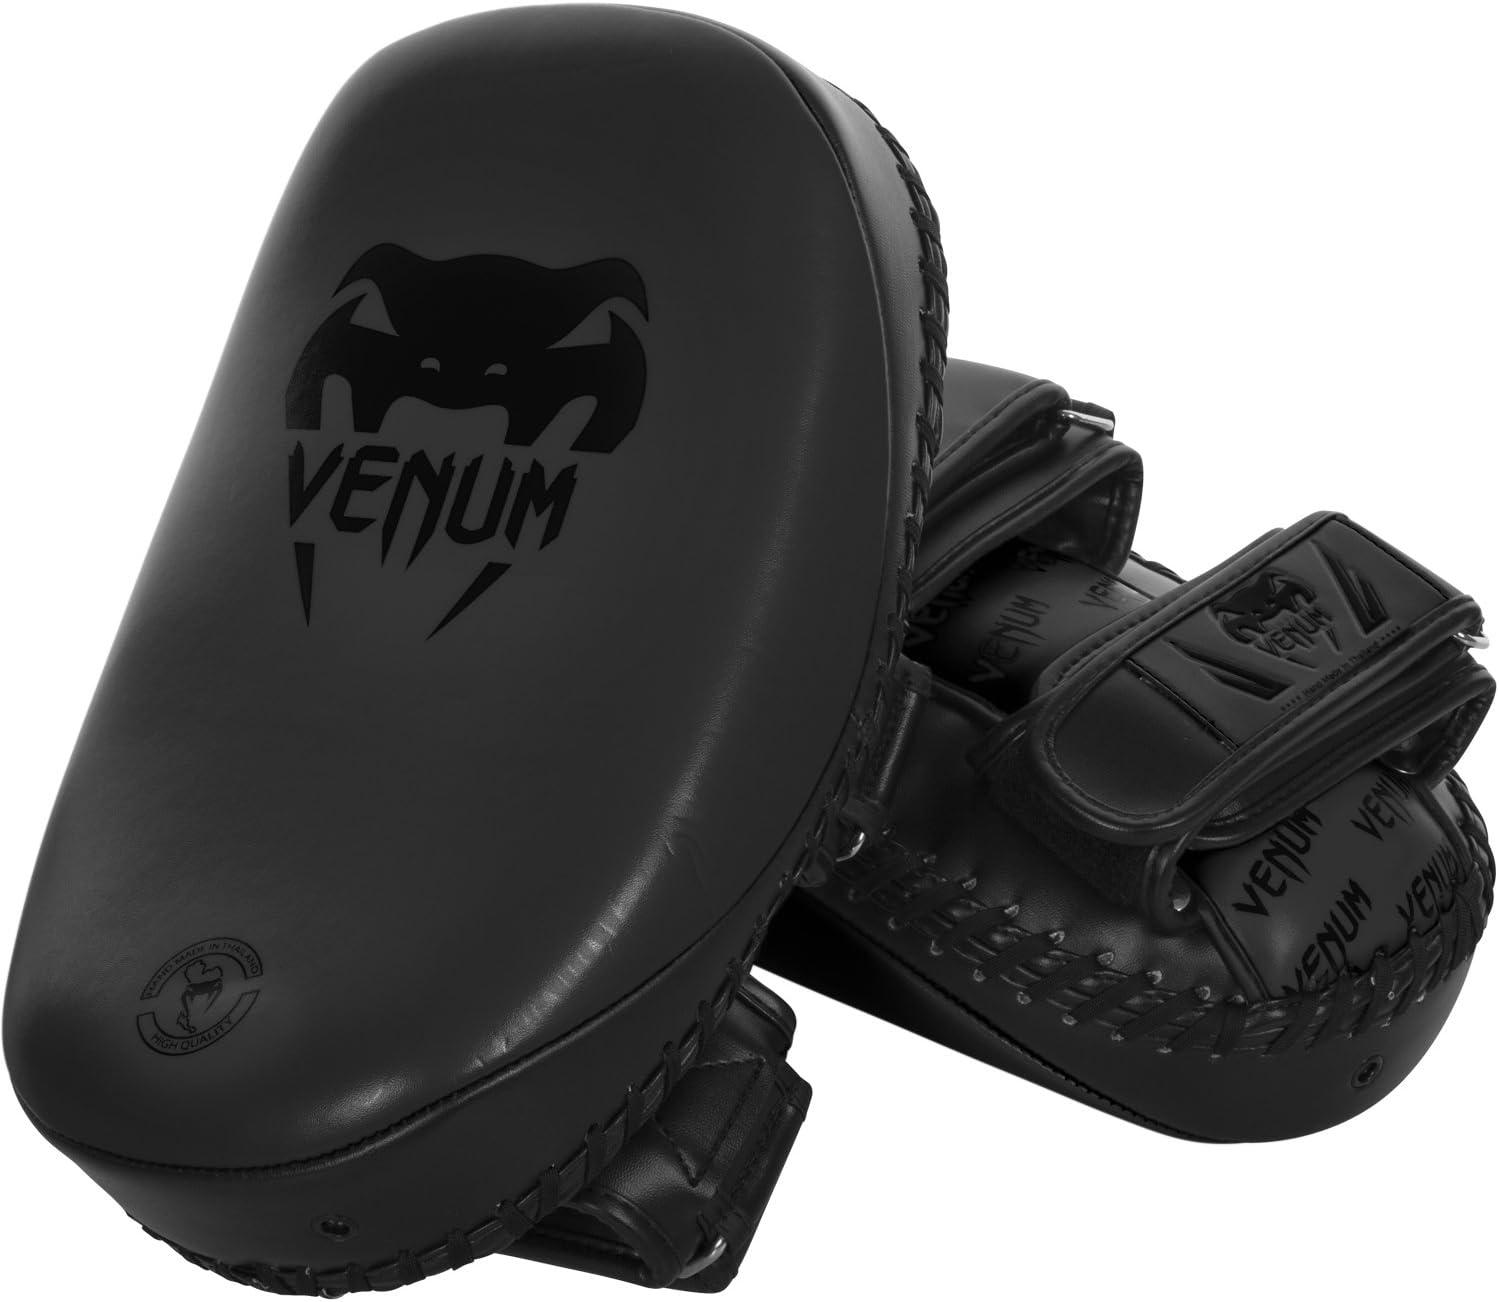 Venum Skintexレザーライトキックパッド(ペア) Matte/黒